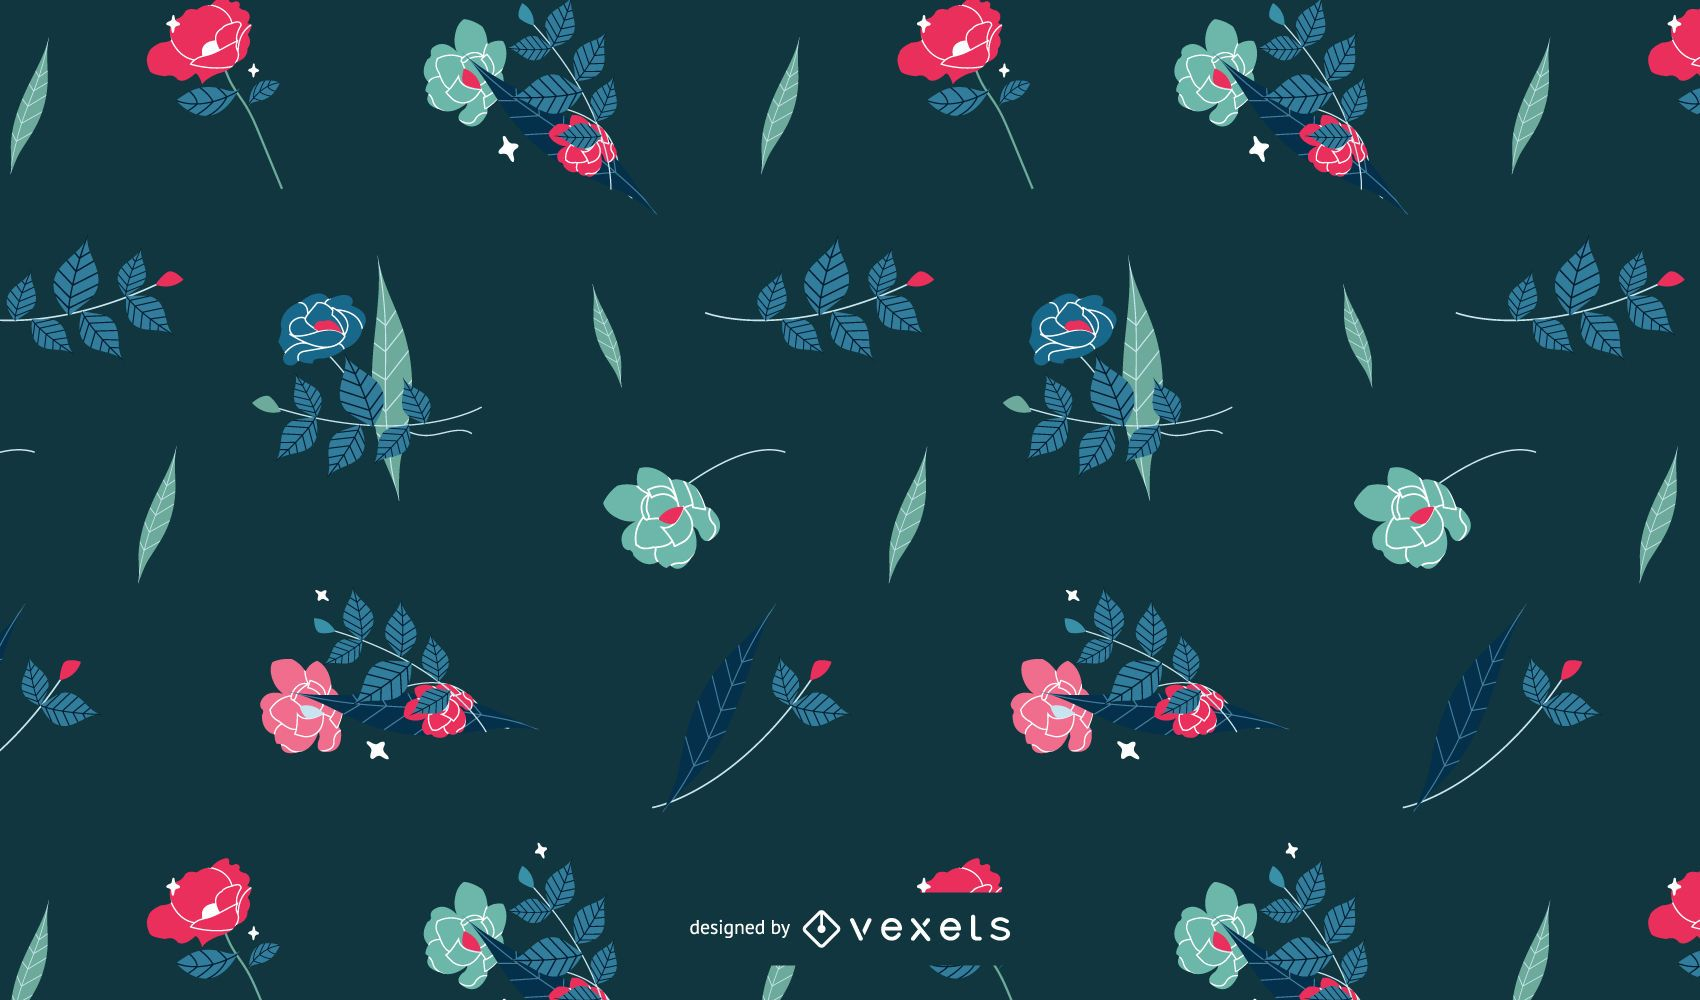 Cute floral pattern design